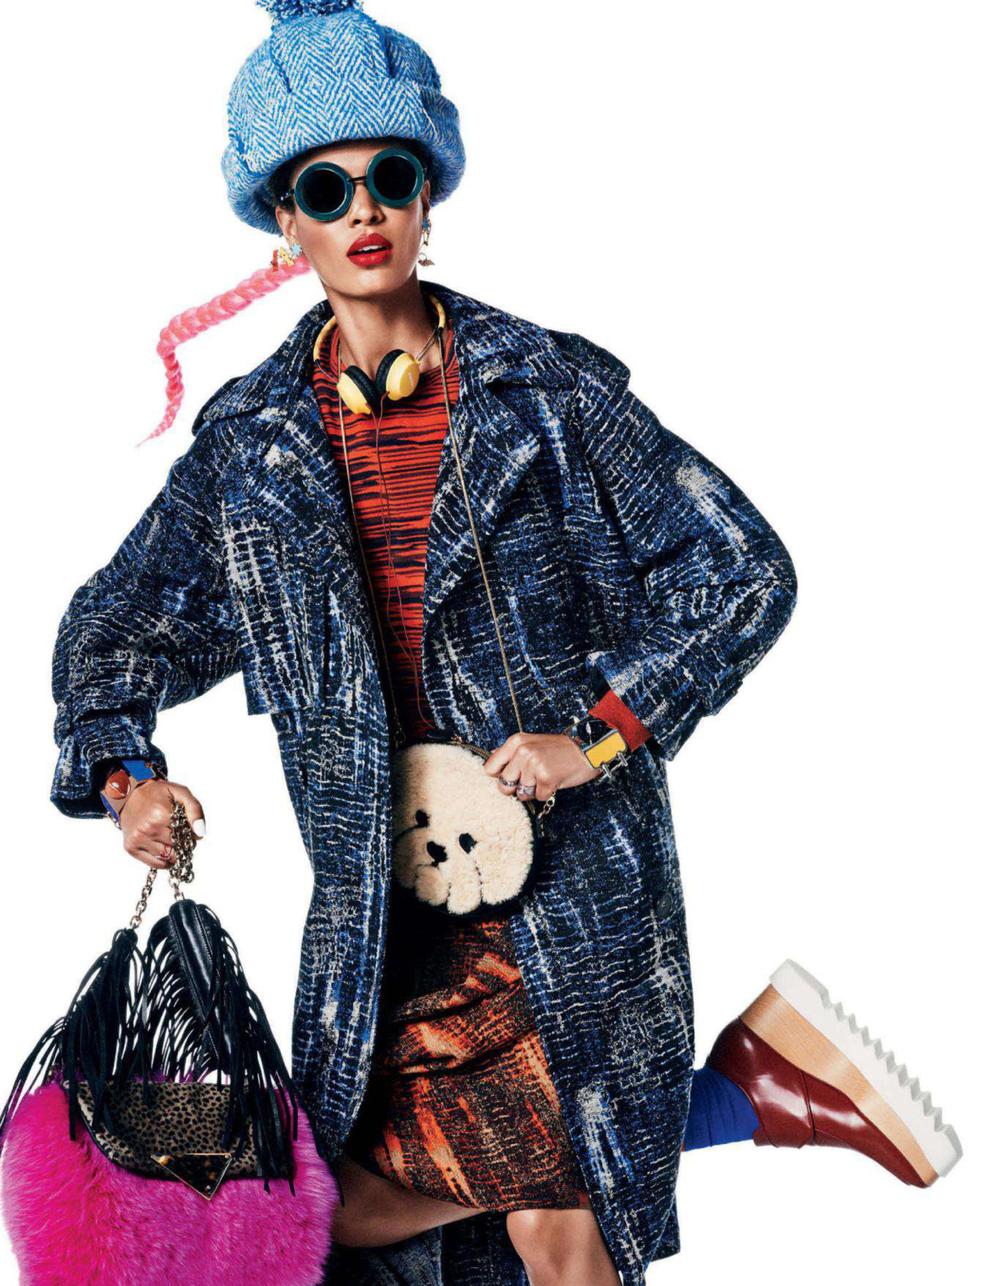 Giampaolo-Sgura-Joan-Smalls-Vogue-Japan-December-2014-3.jpg